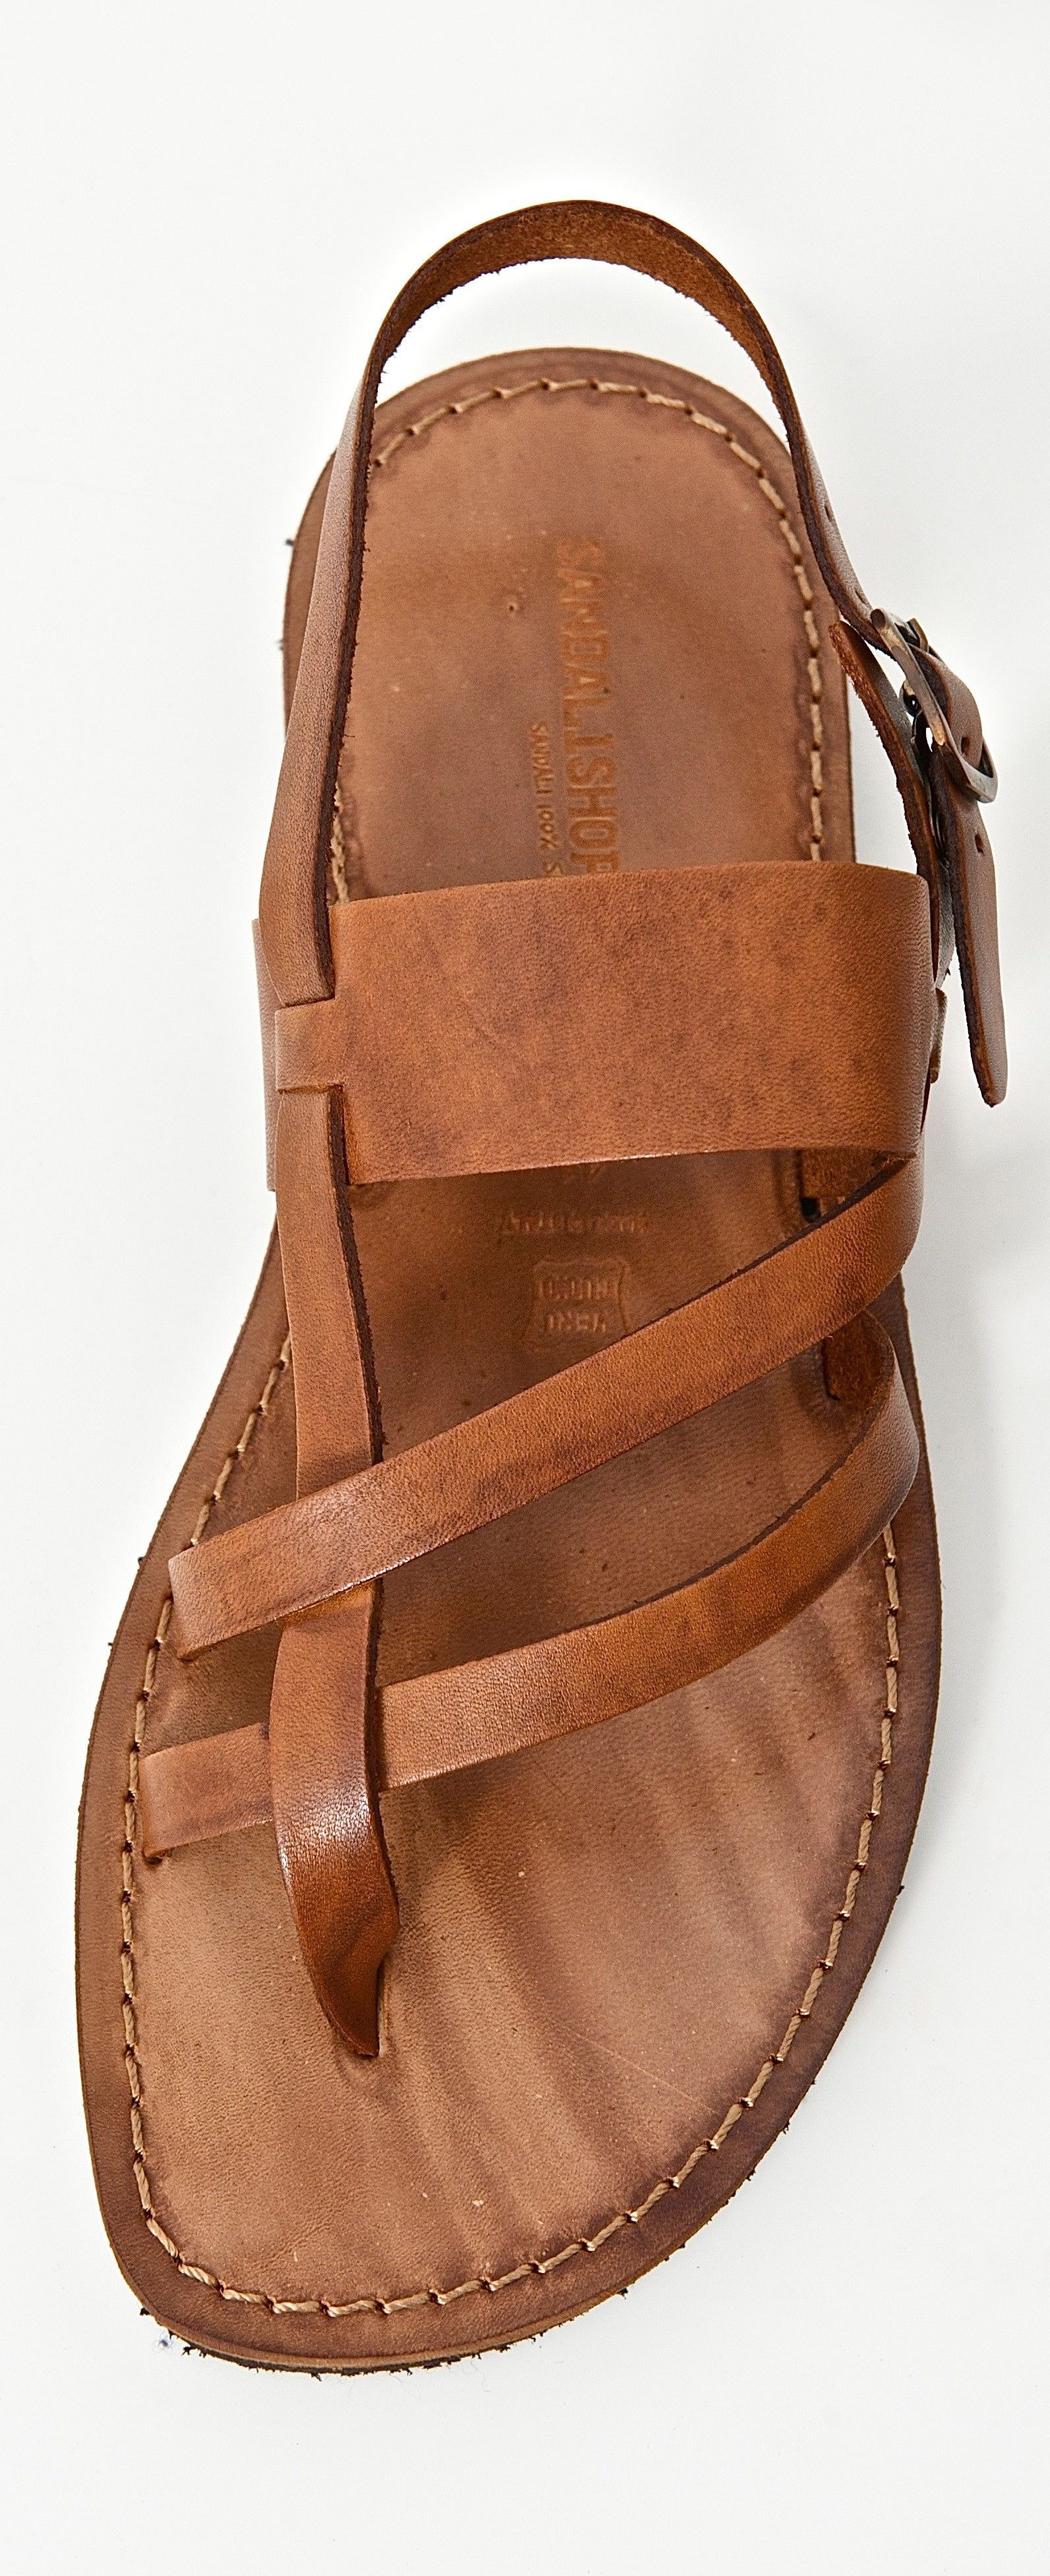 ed38d68b870f0 Sandals